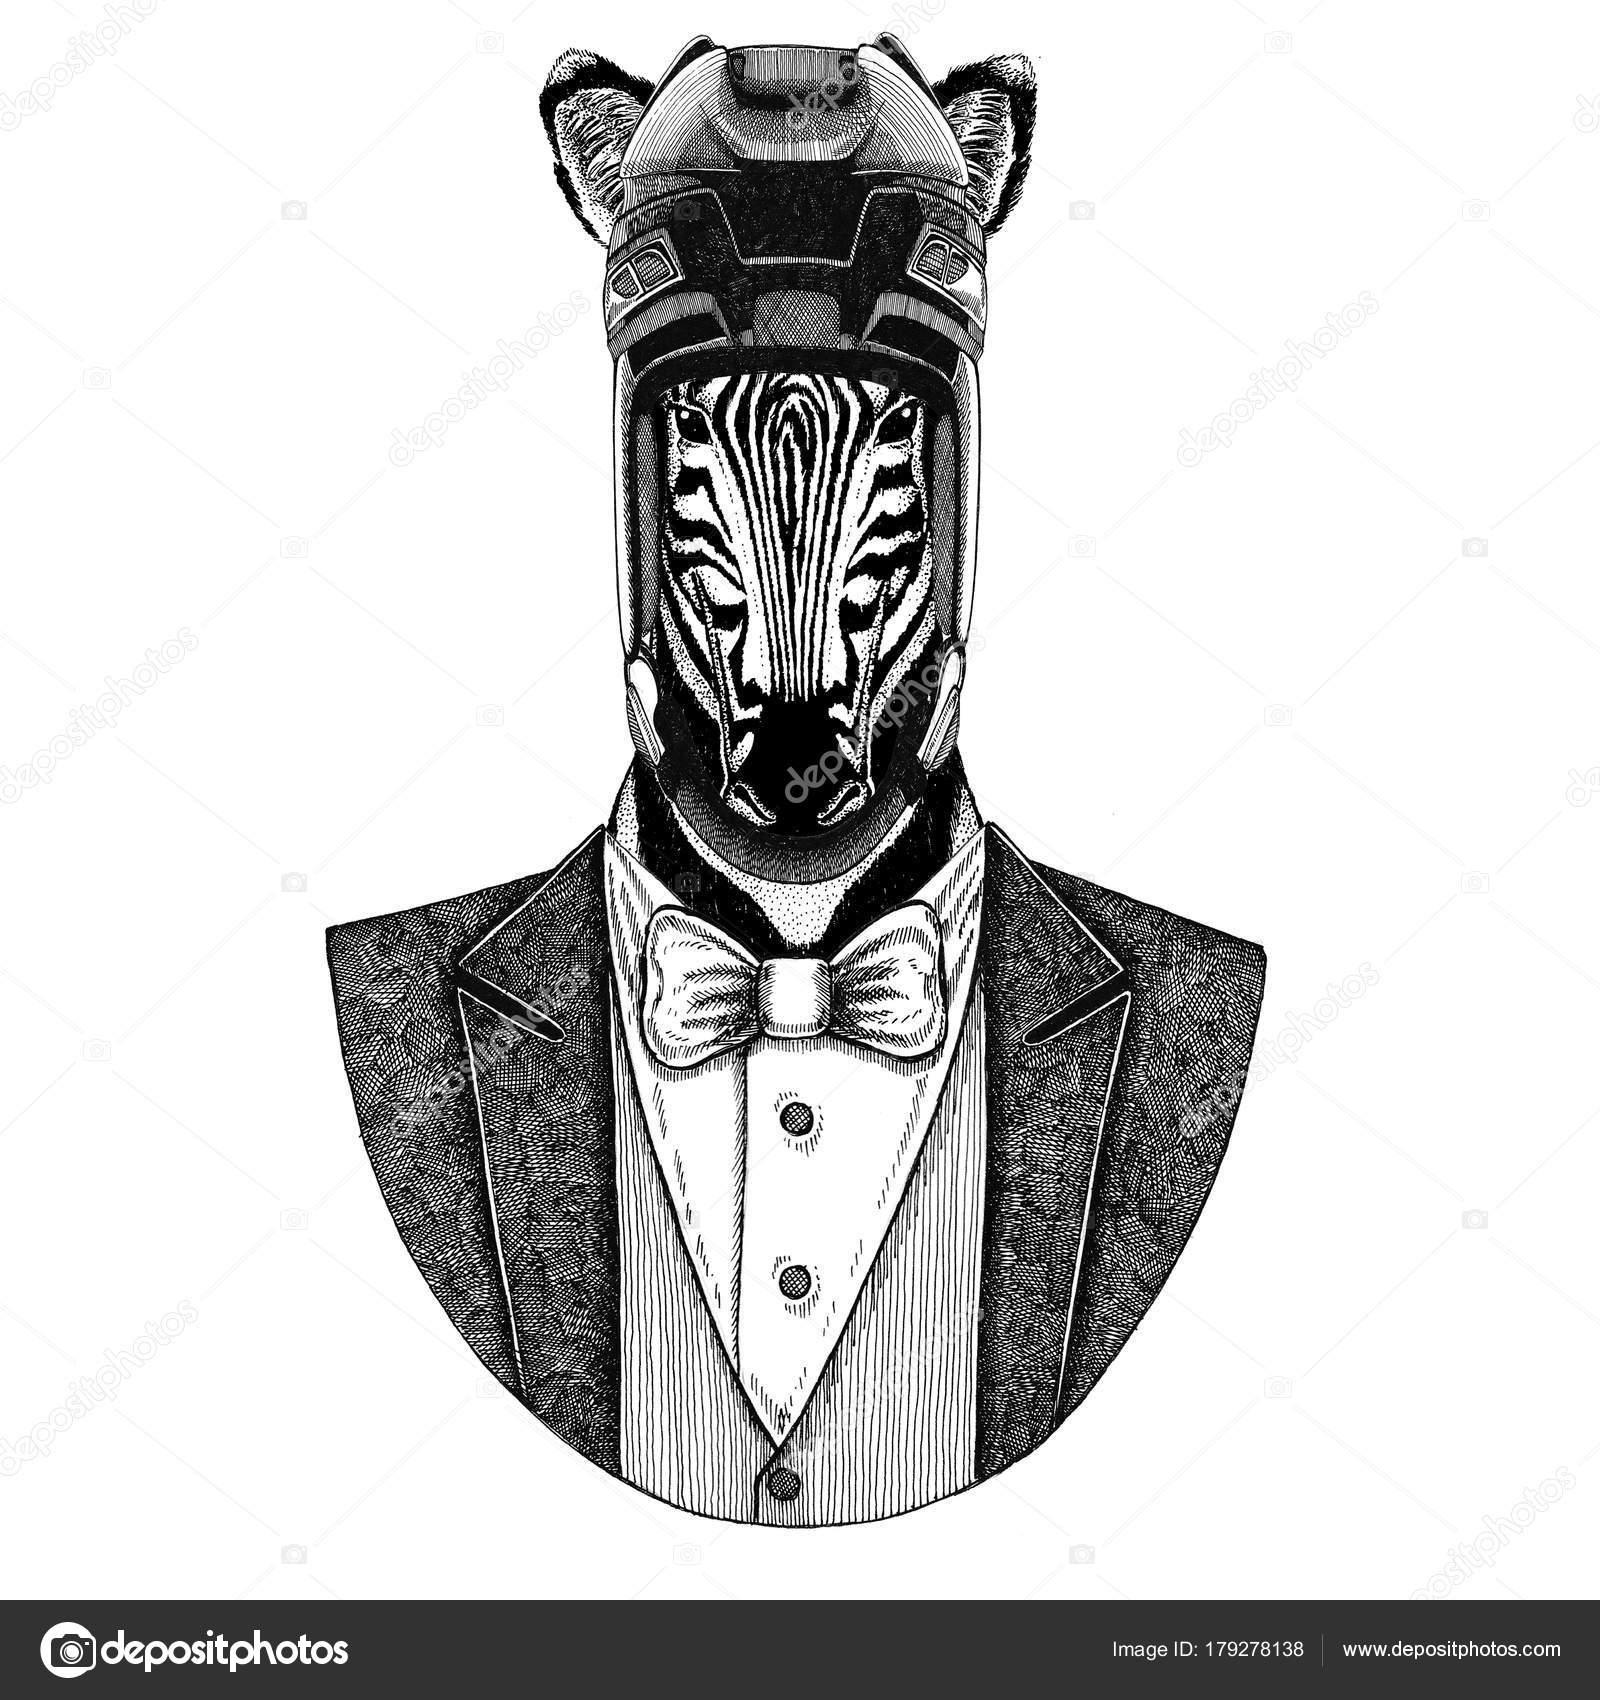 aeac70cba Animal wearing jacket with bow-tie and hockey helmet or aviatior helmet.  Elegant hockey player. Image for tattoo